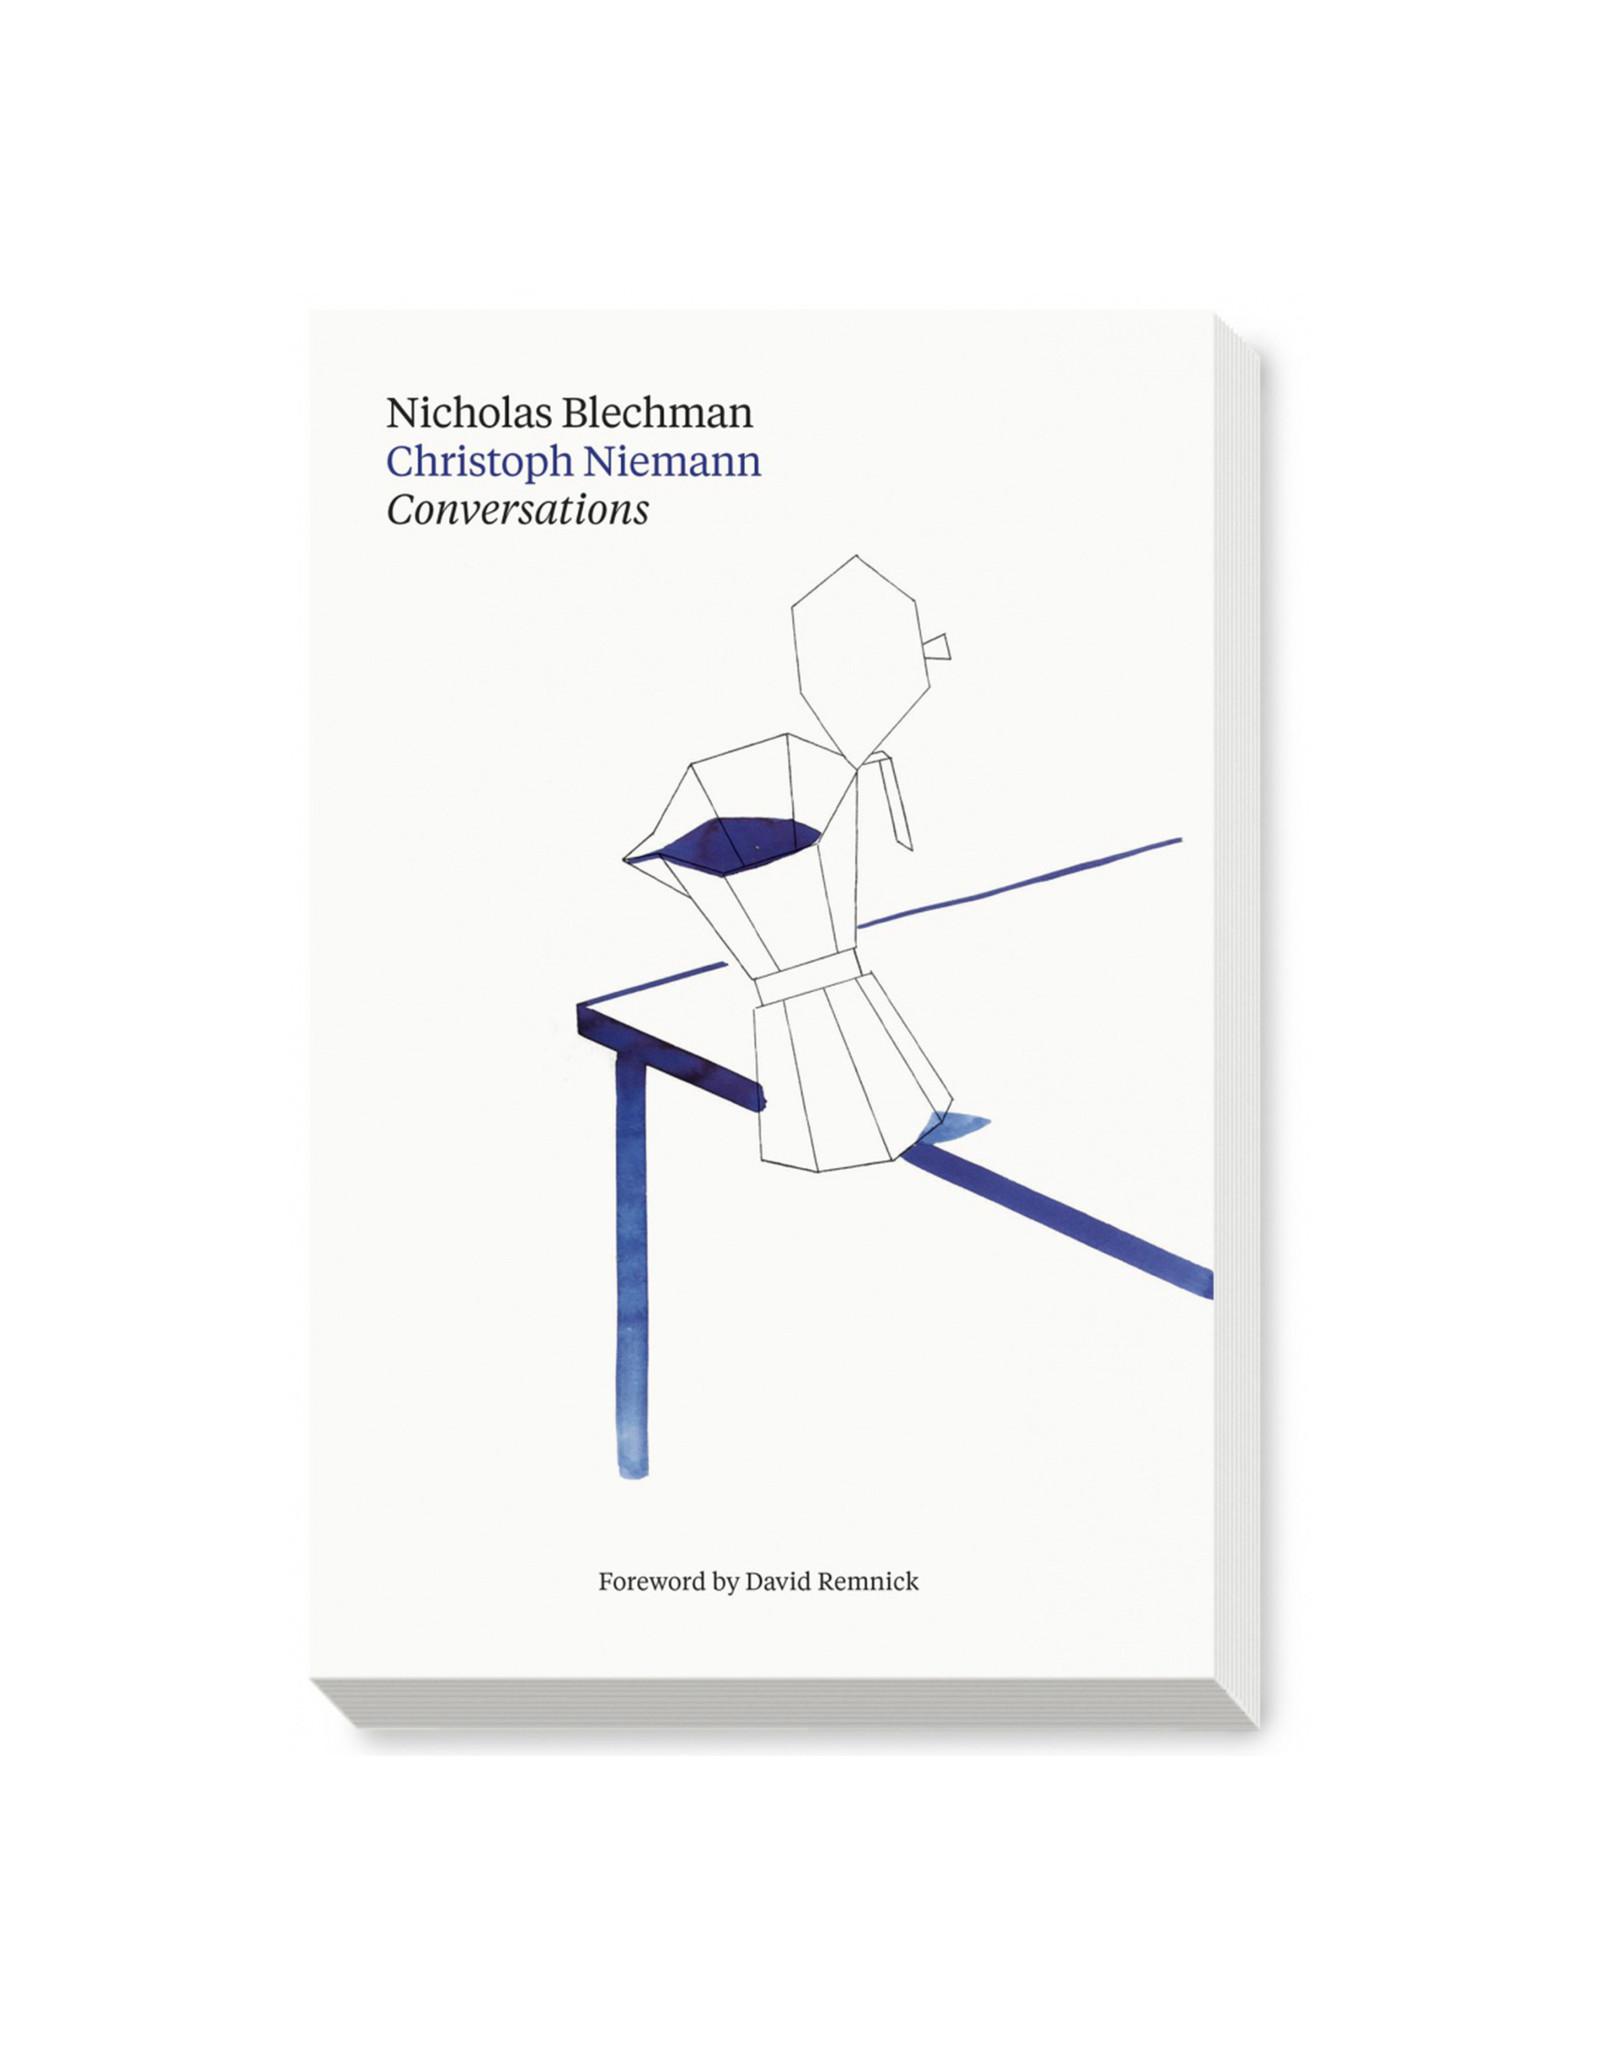 Conversations: Nicholas Blechman & Christoph Niemann